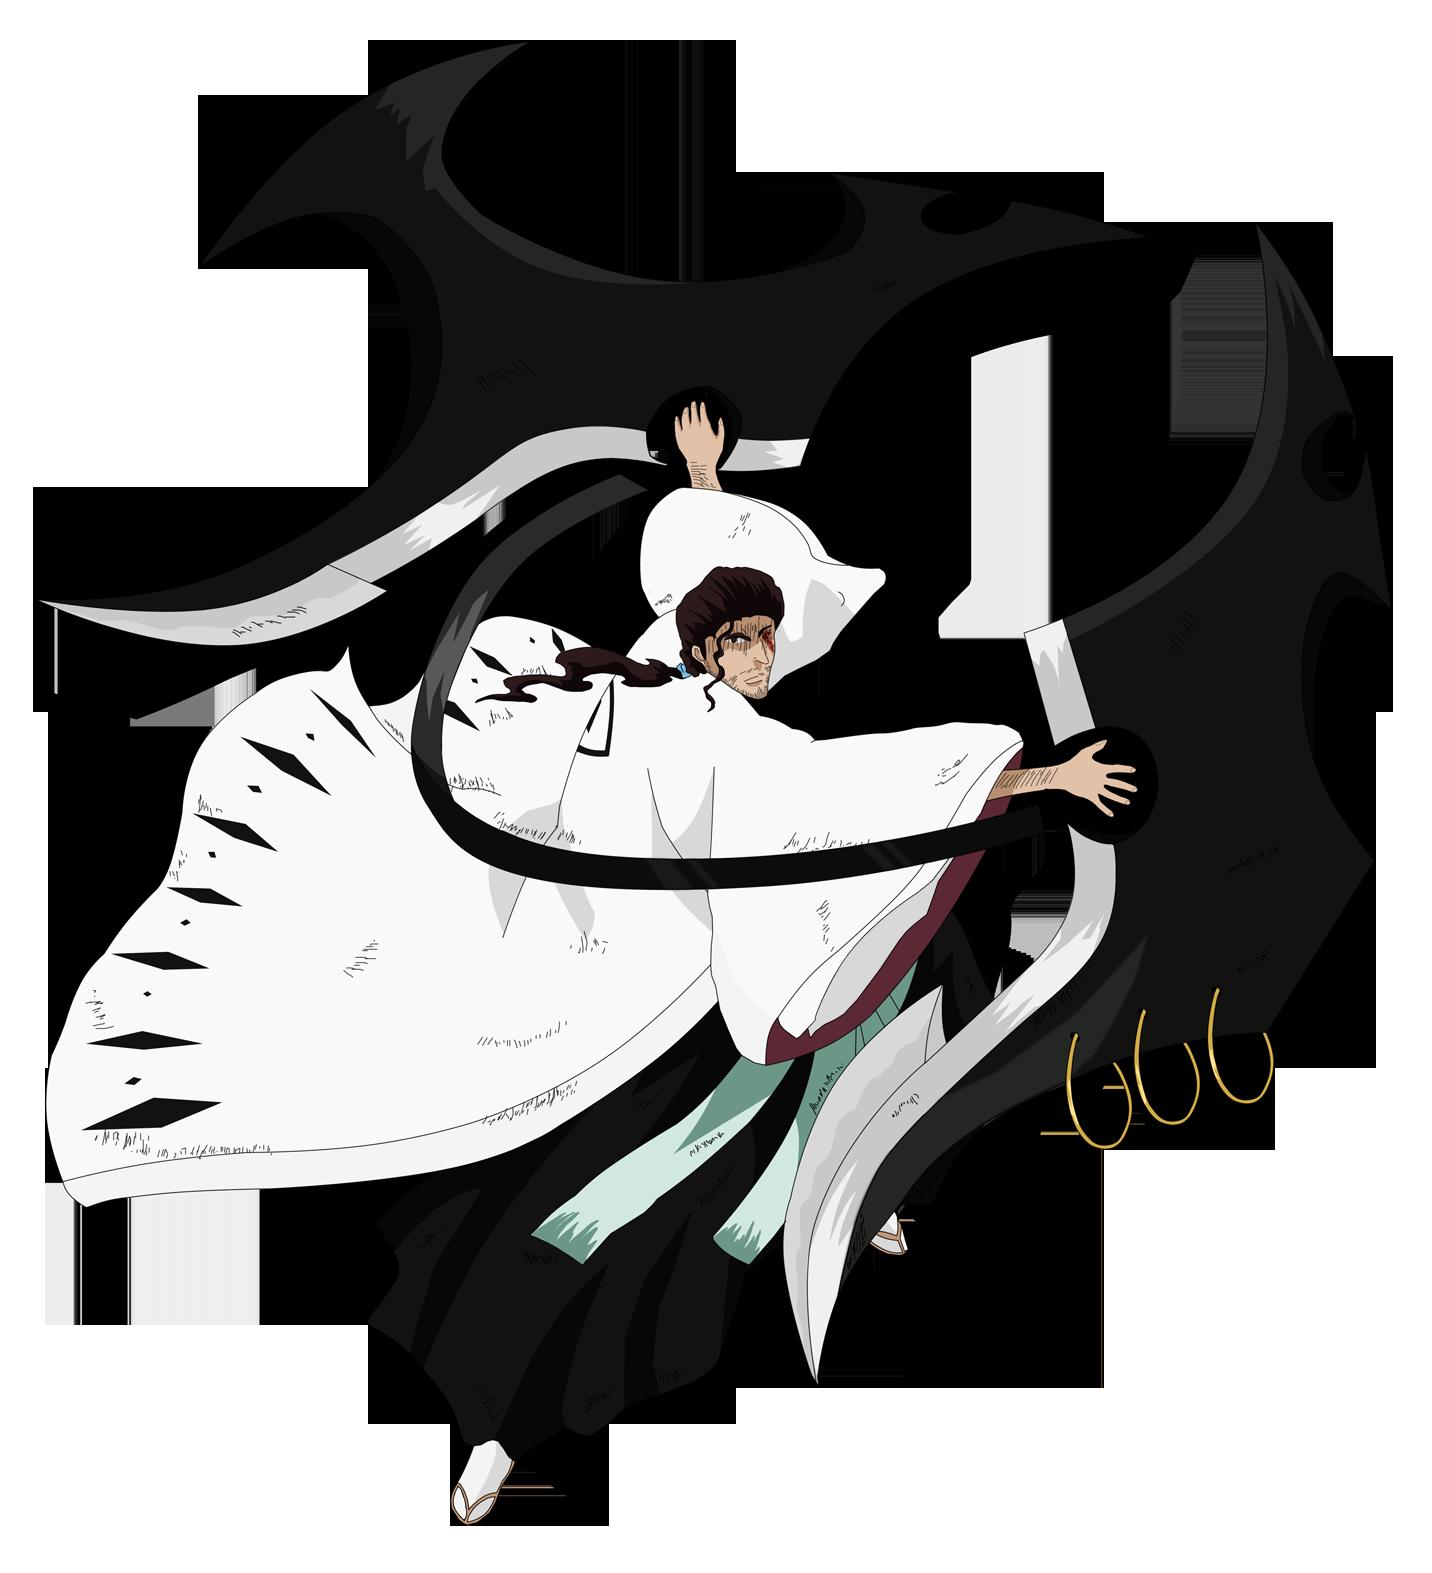 Shunsui Kyoraku's Bankai – Predictions | Daily Anime Art